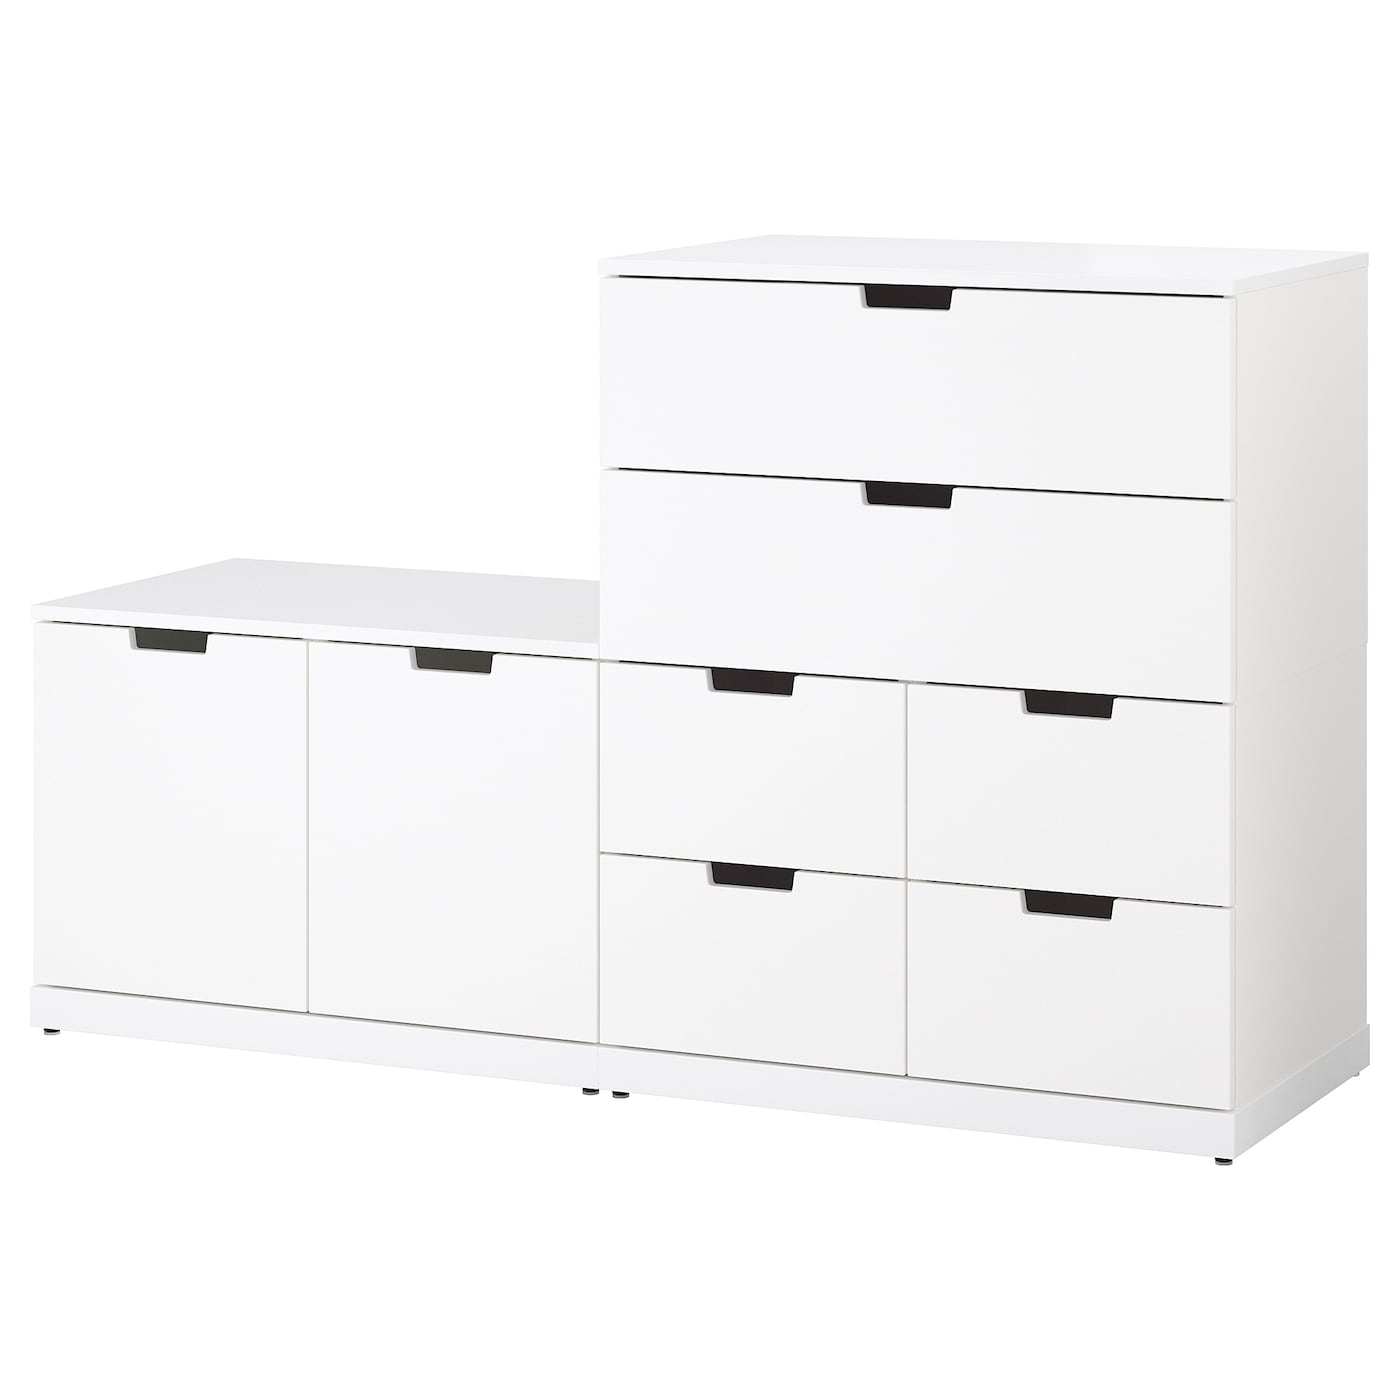 nordli commode 8 tiroirs blanc 160 x 99 cm ikea. Black Bedroom Furniture Sets. Home Design Ideas